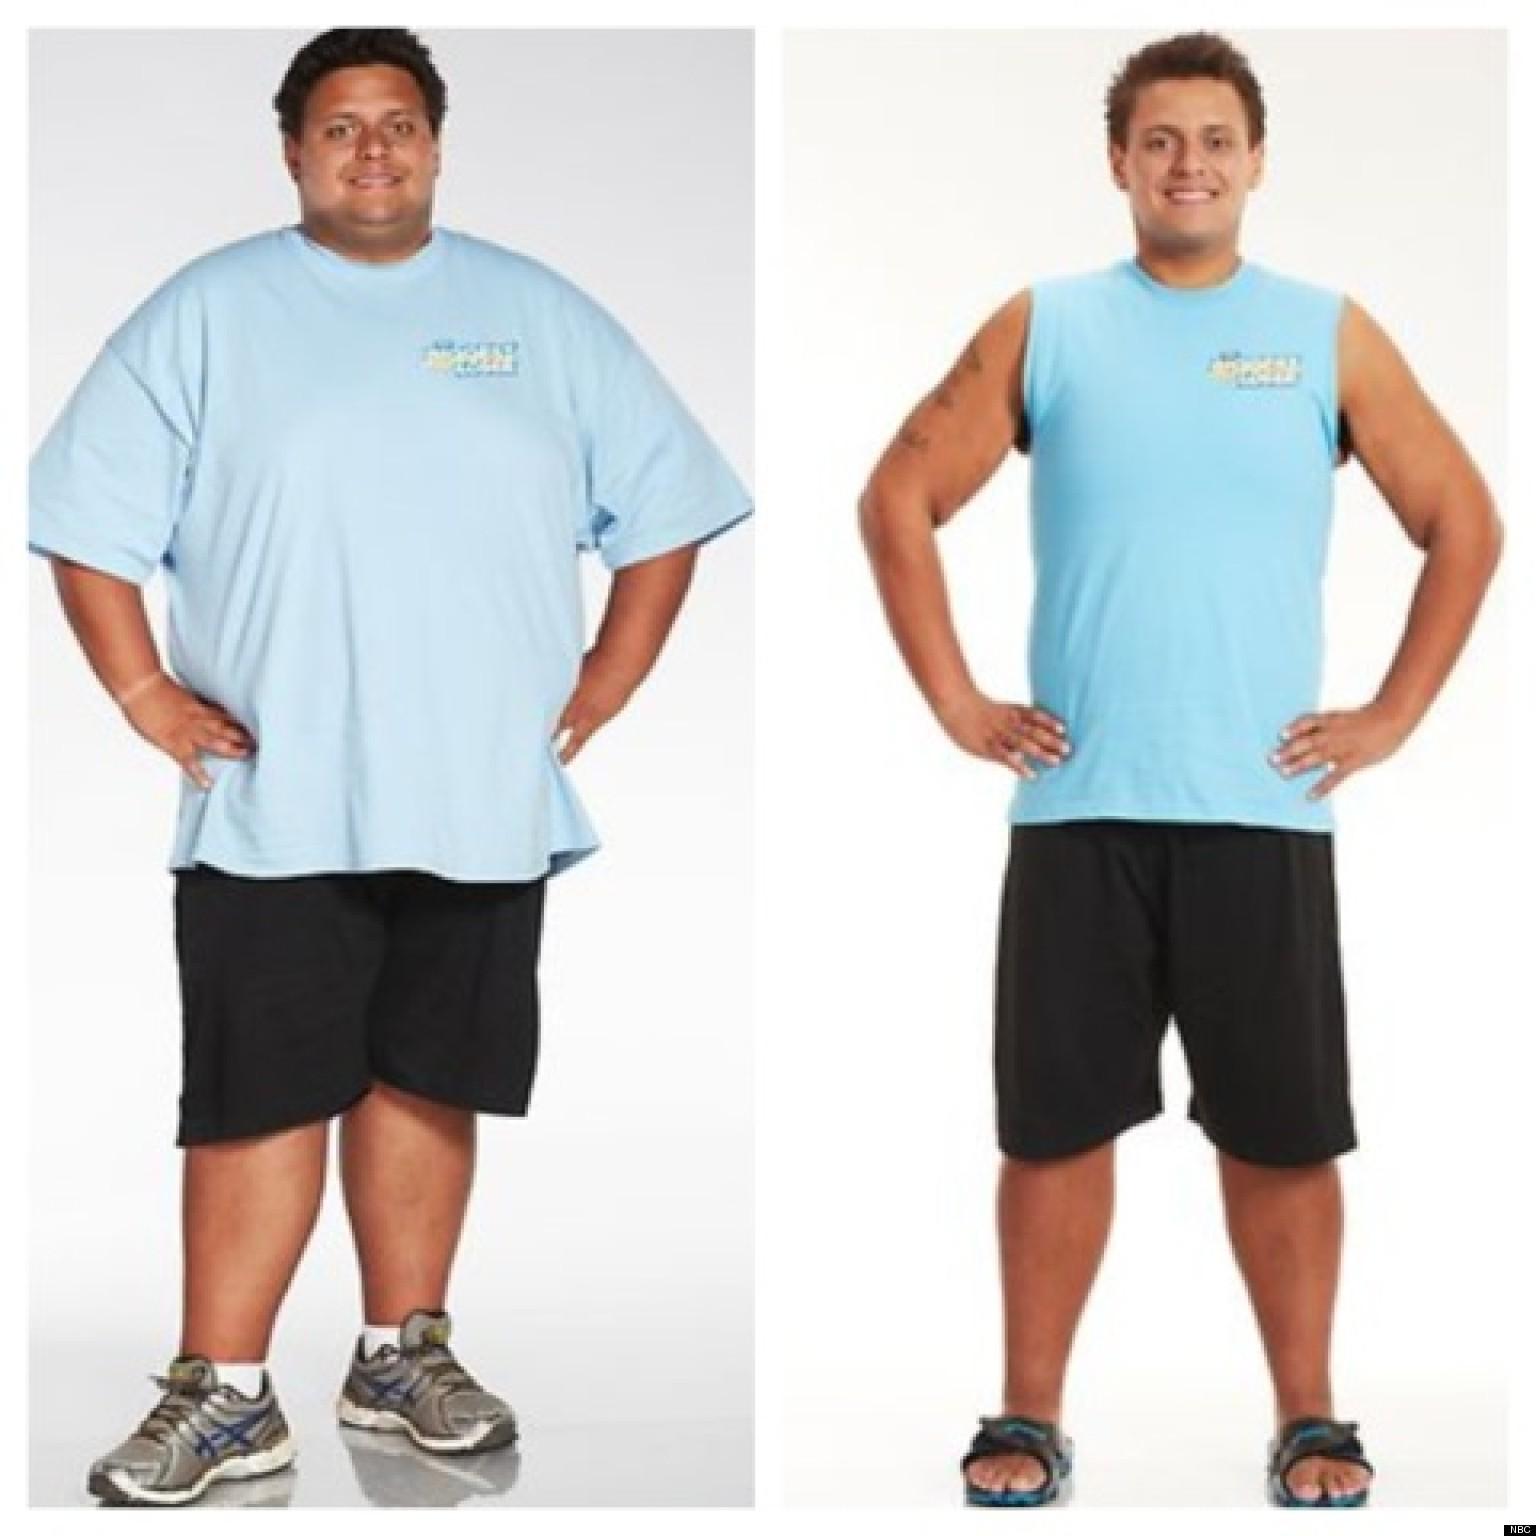 Biggest Loser Runner-Up Jeff Lost 181 Pounds